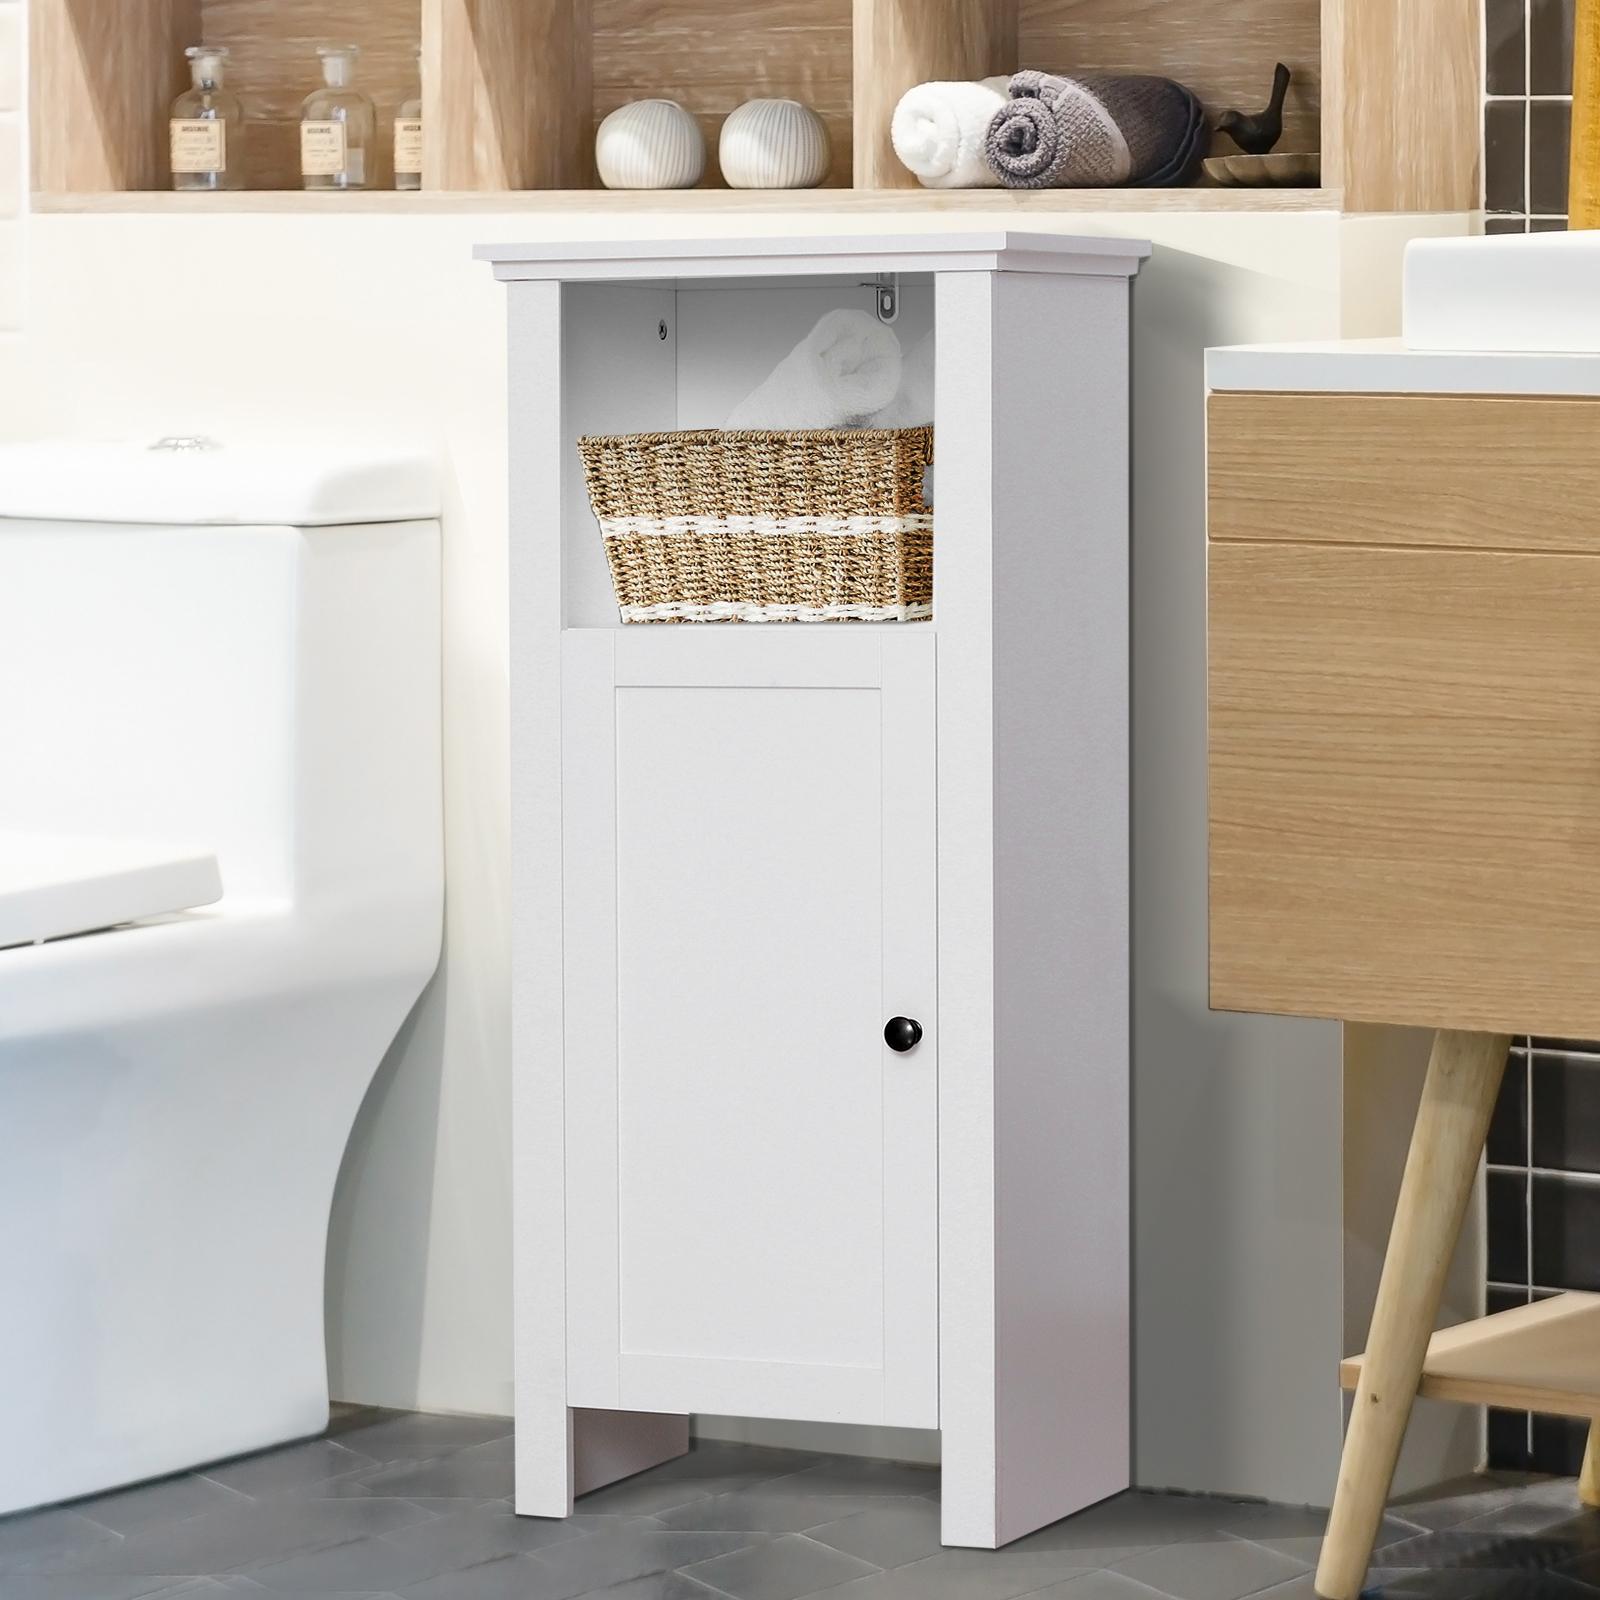 Details About 36 Compact Freestanding Bathroom Storage Cabinet Organizer White regarding size 1600 X 1600